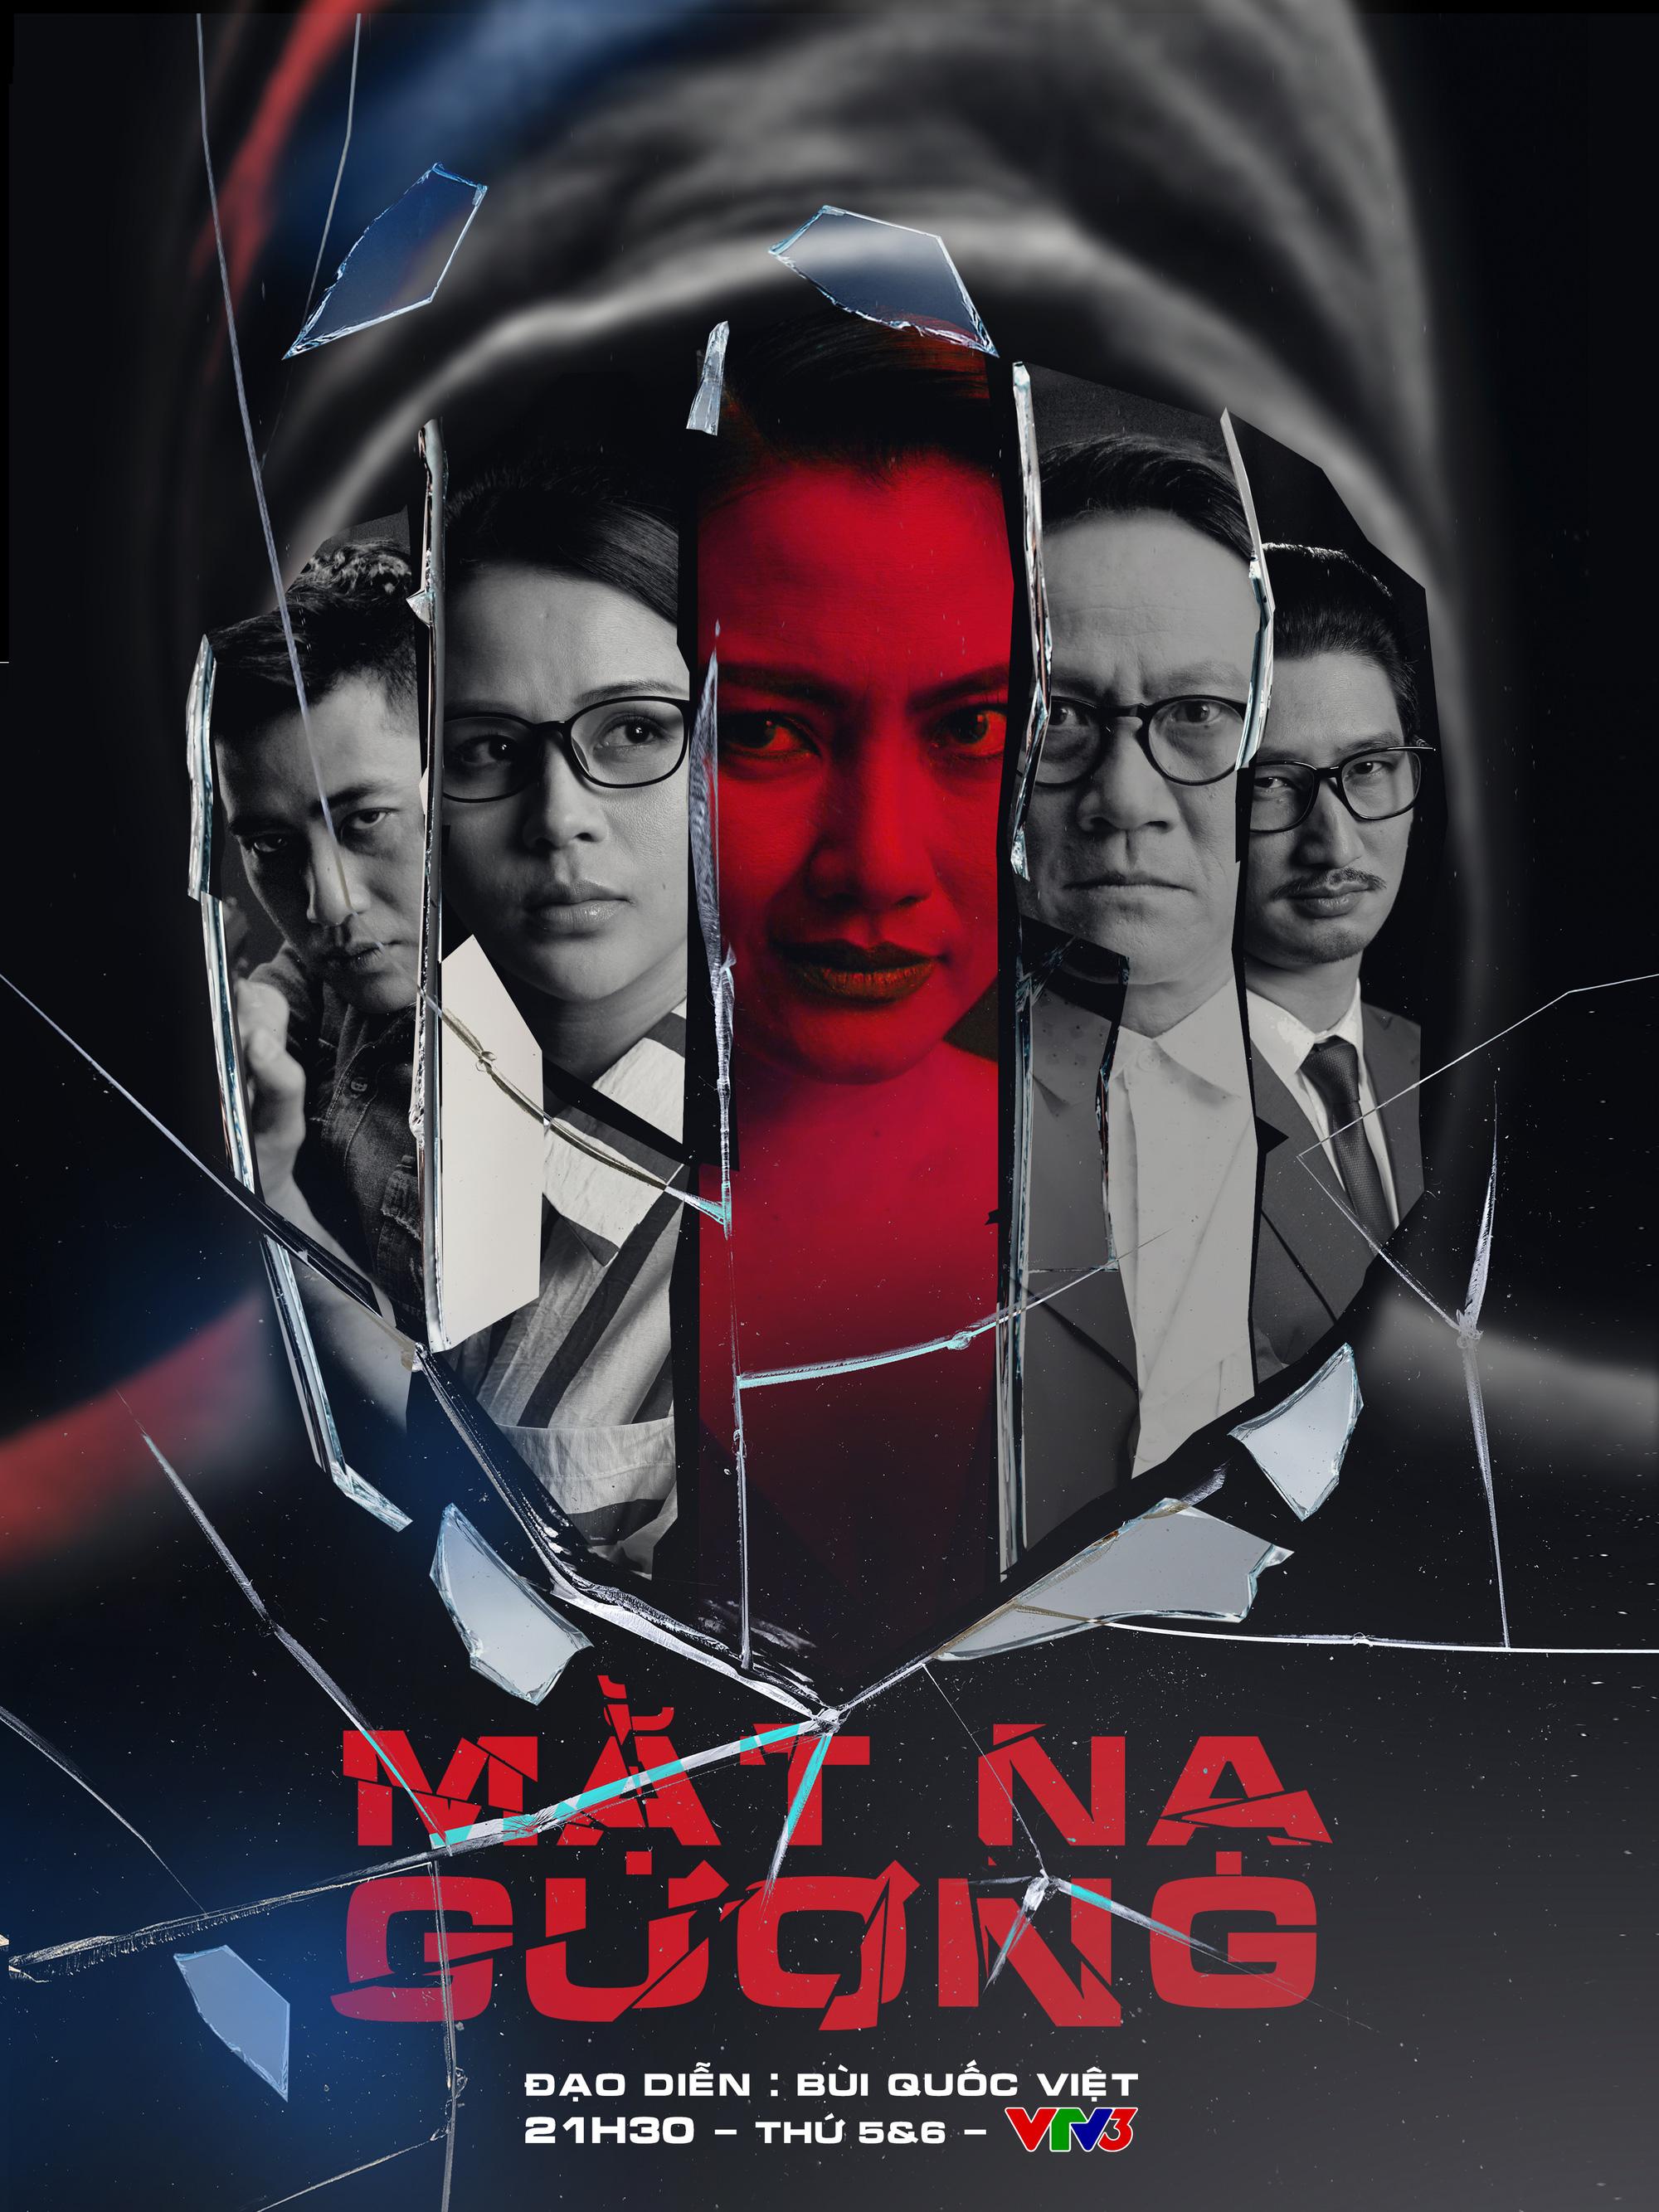 poster-mat-na-guong-poster-printart-1633755811868240956829.jpg